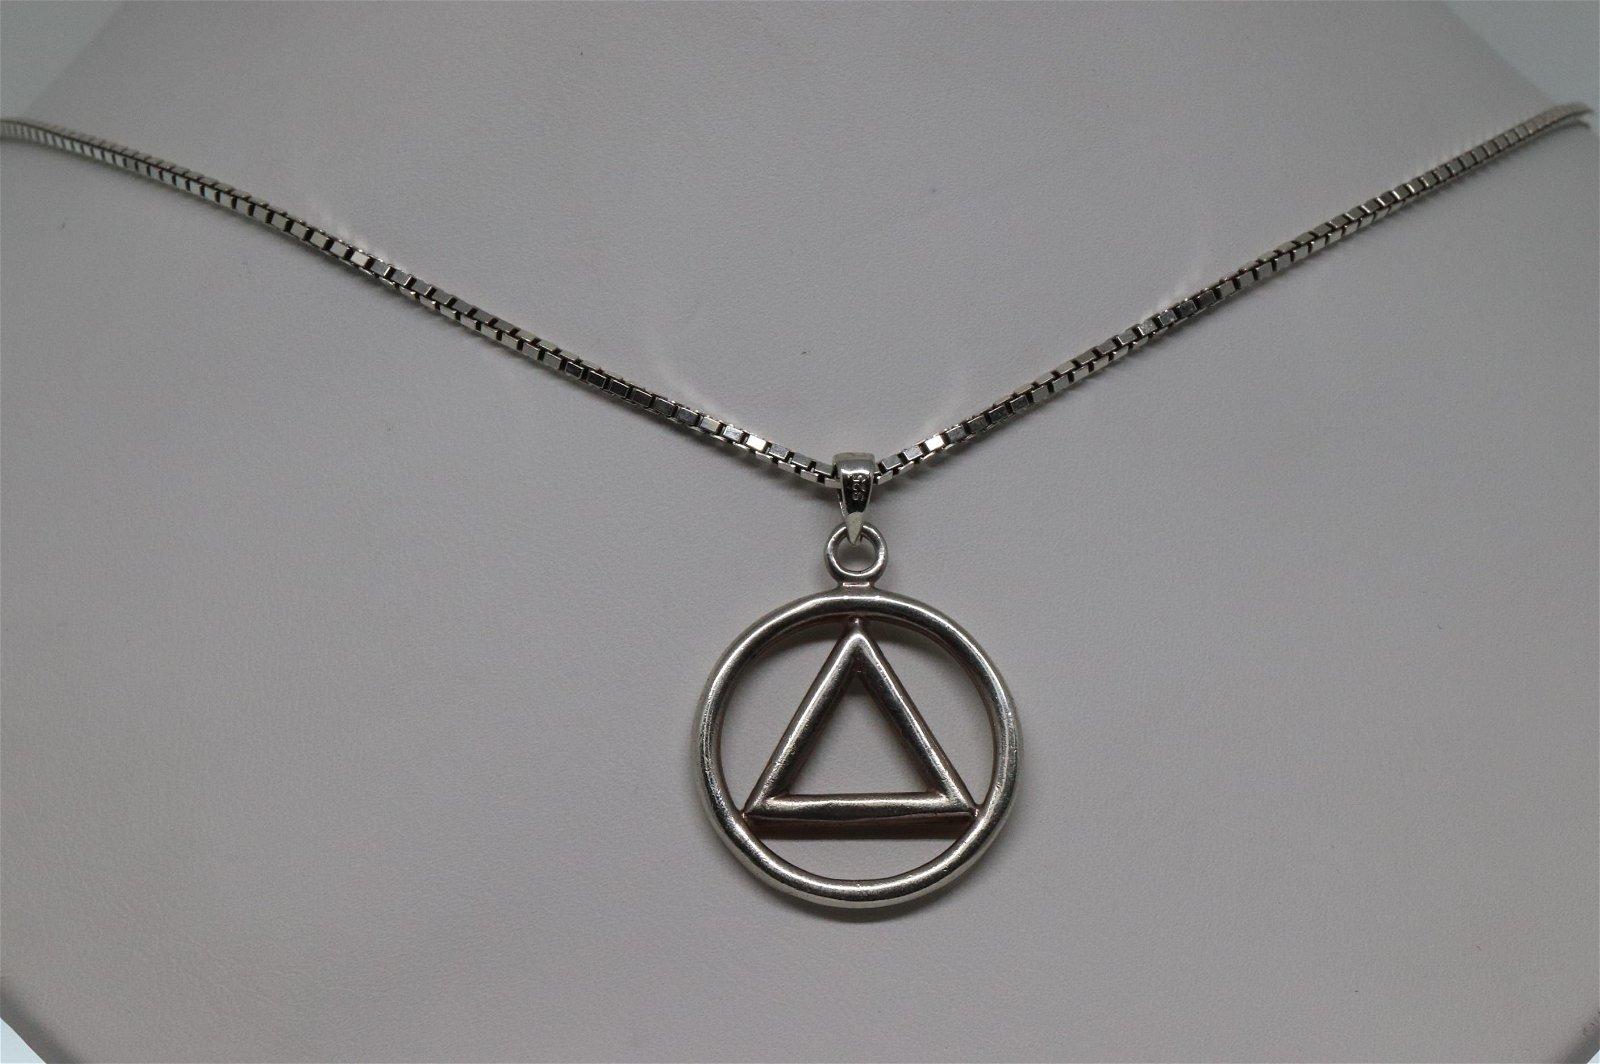 Silver necklace & Pendant